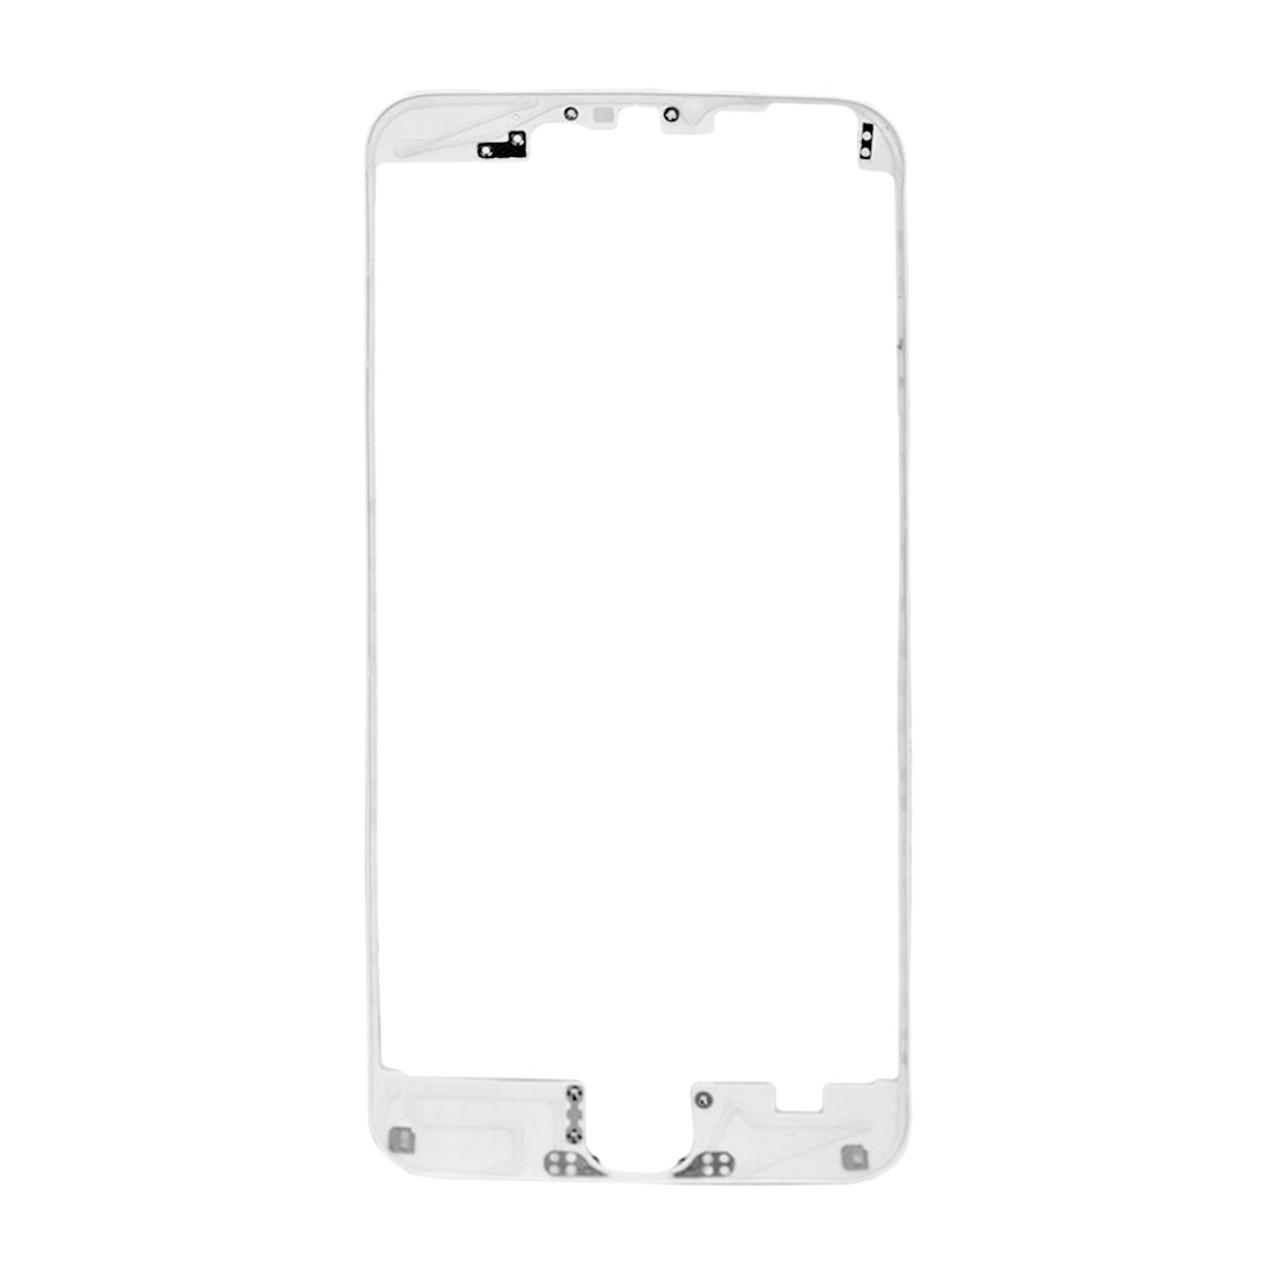 Рамка для дисплея Apple iPhone 6G Plus AAA внутренняя пустая White (10)